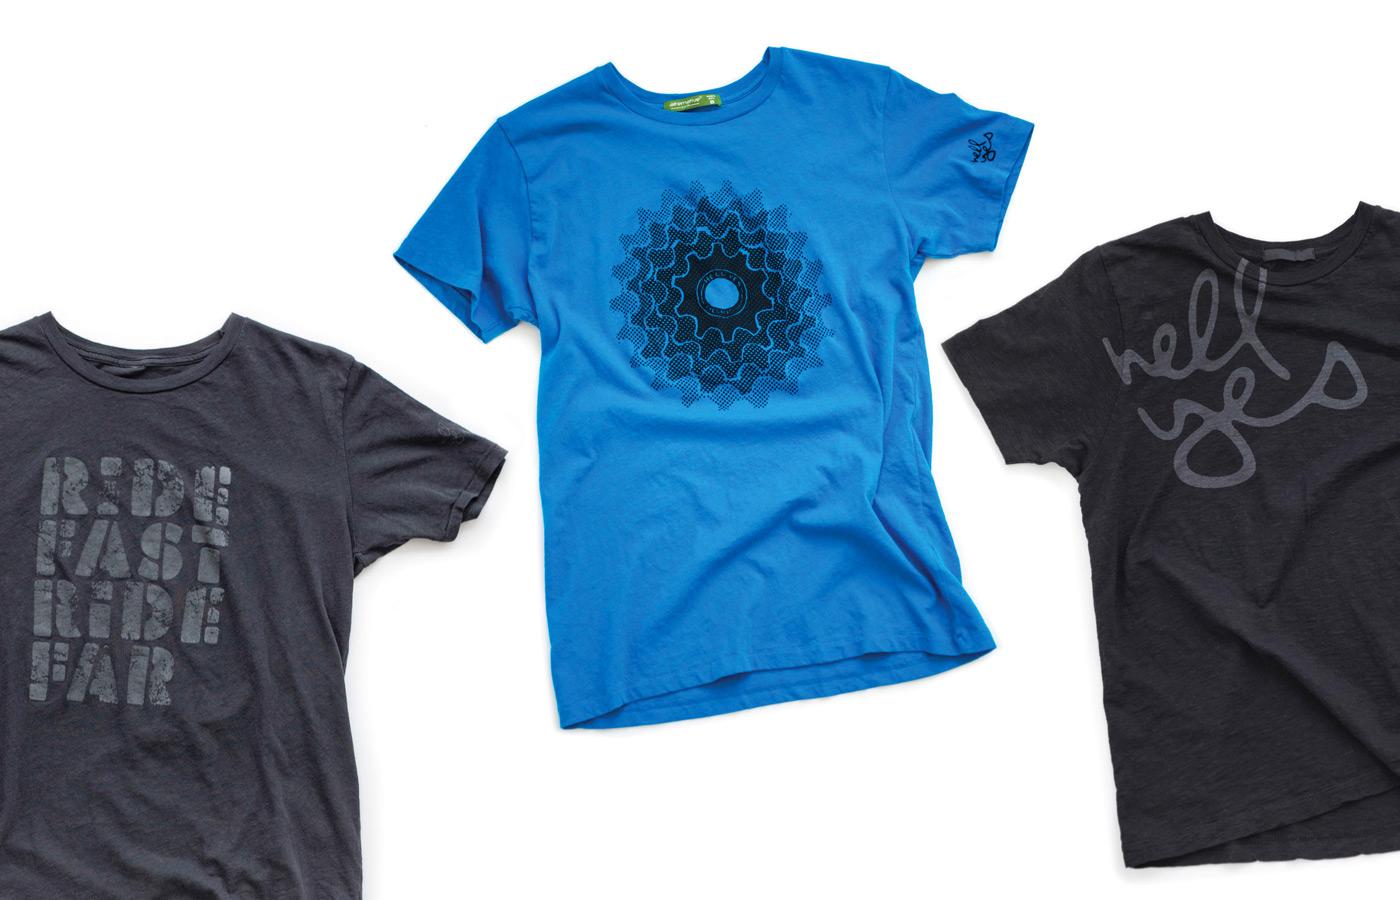 http://carlbeanlarson.com/files/gimgs/31_hell-yes-t-shirts_v2.jpg